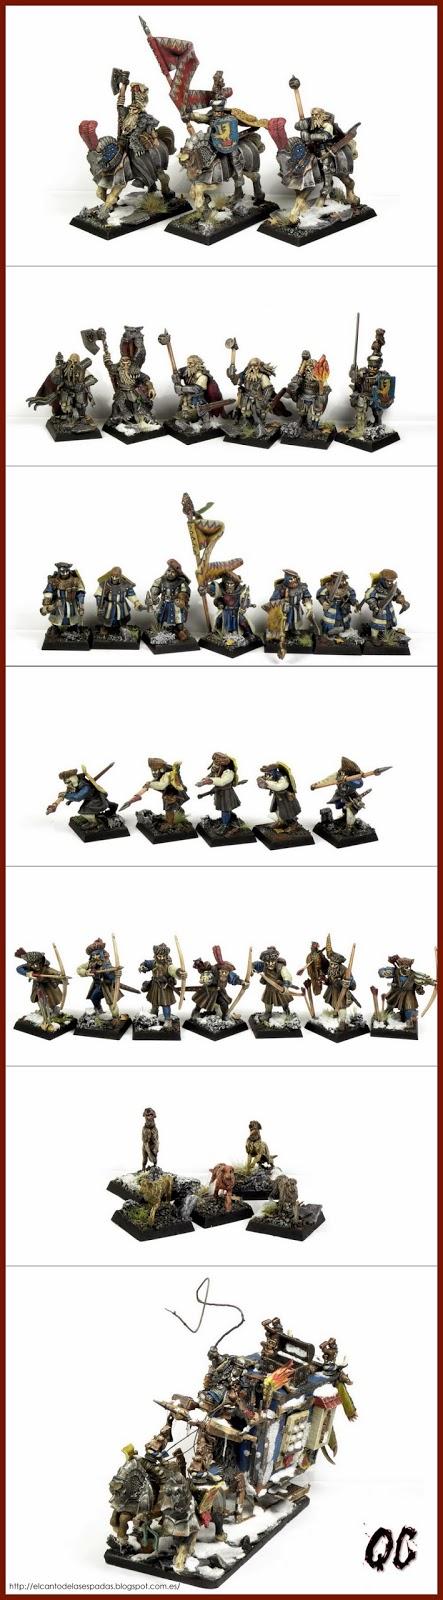 middenland-middenhein-mordheim-warband-warhammer